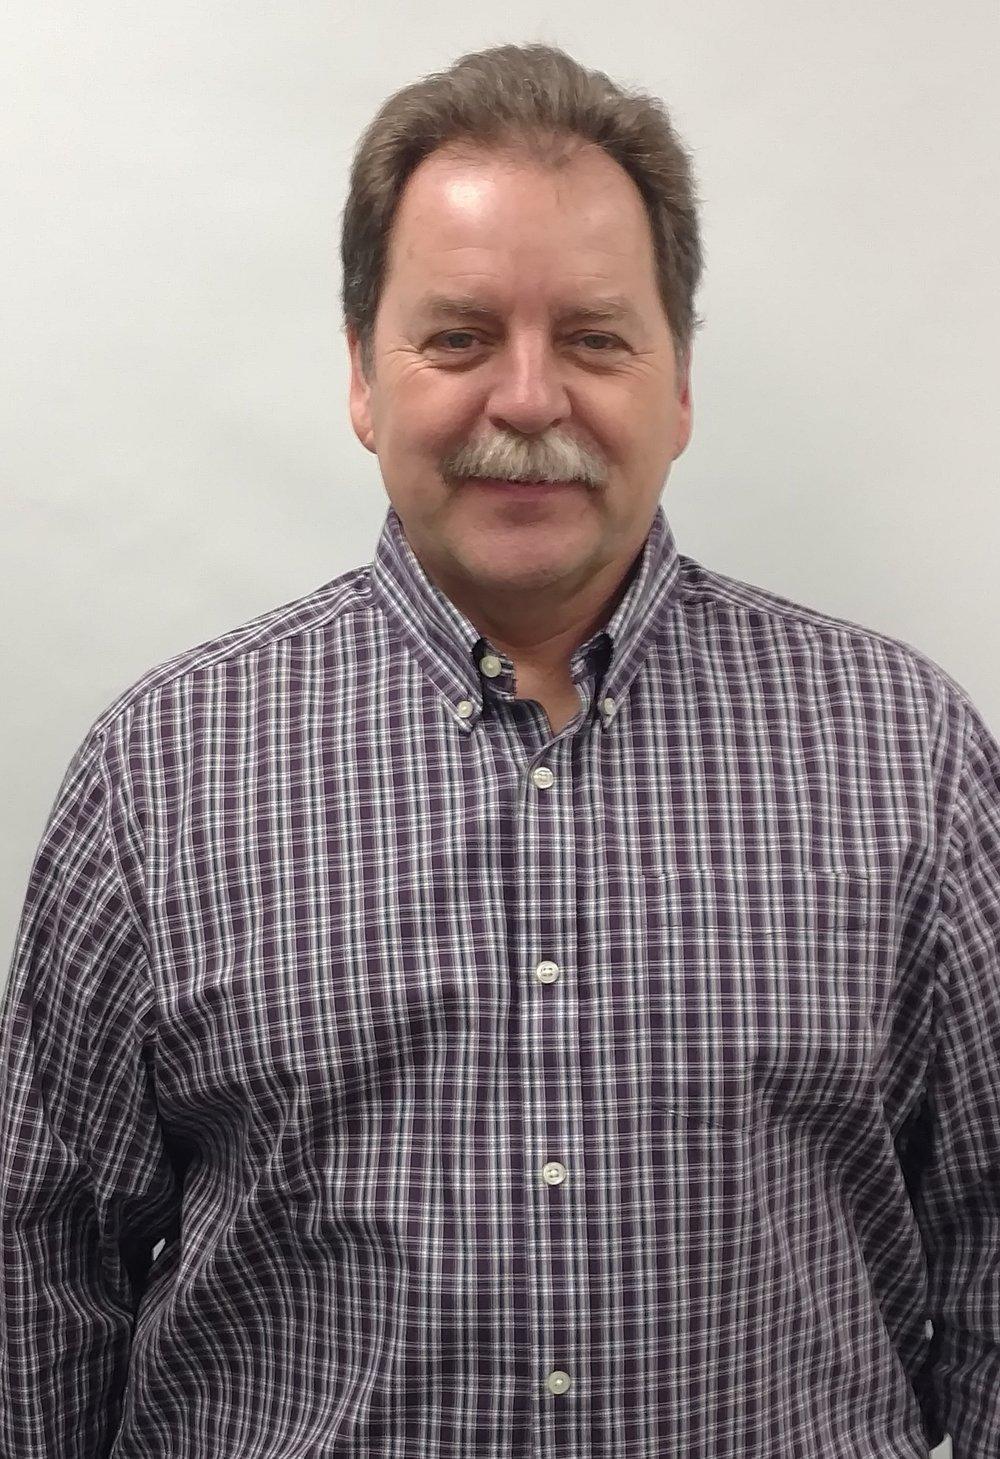 Steve Schug-Vice President